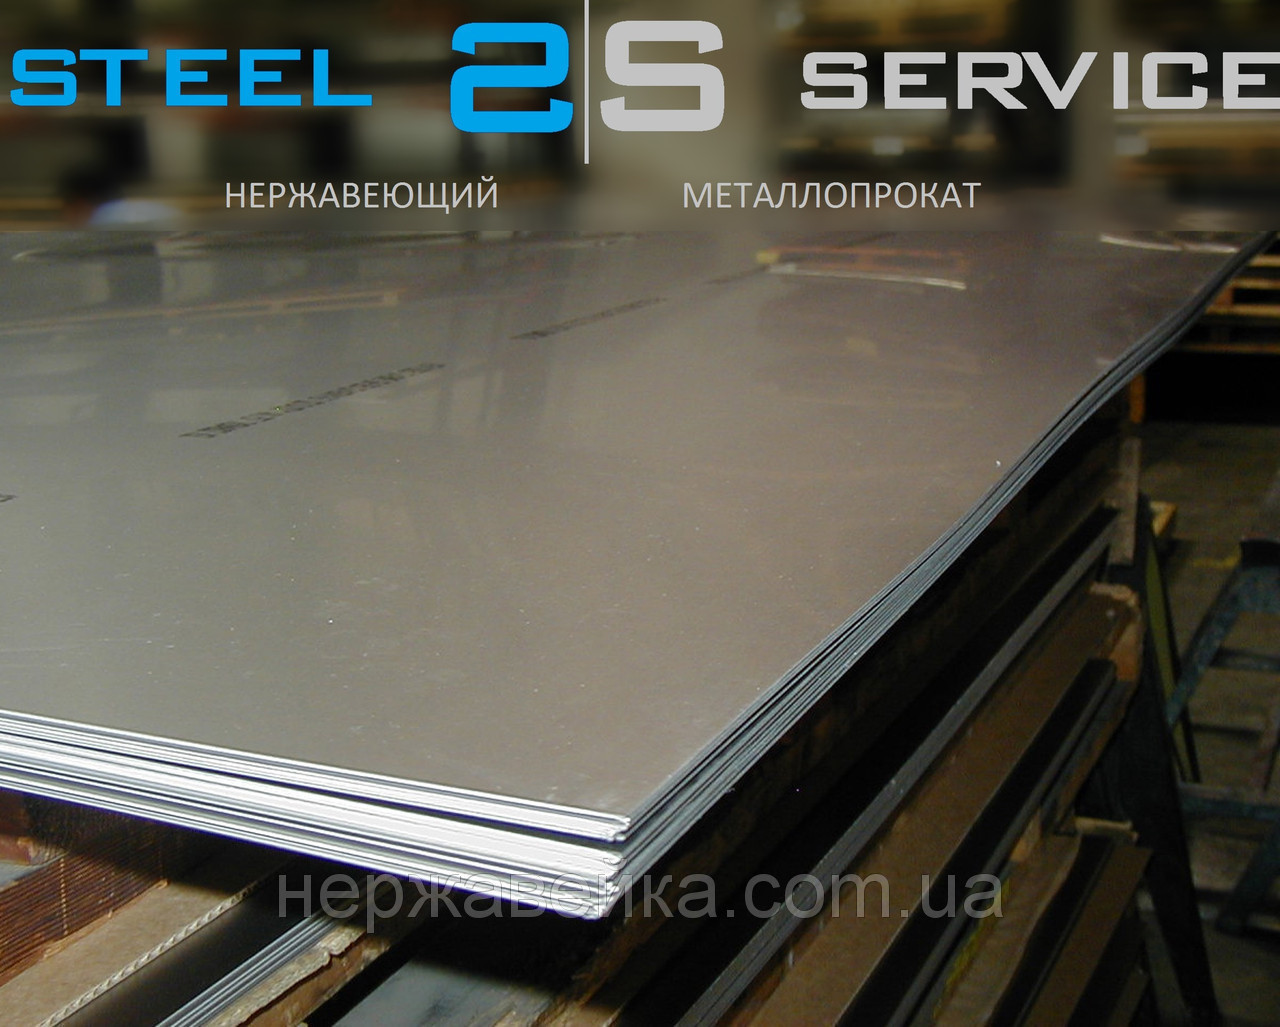 Листовая нержавейка 10х1000х2000мм AISI 430(12Х17) 2B - матовый, технический